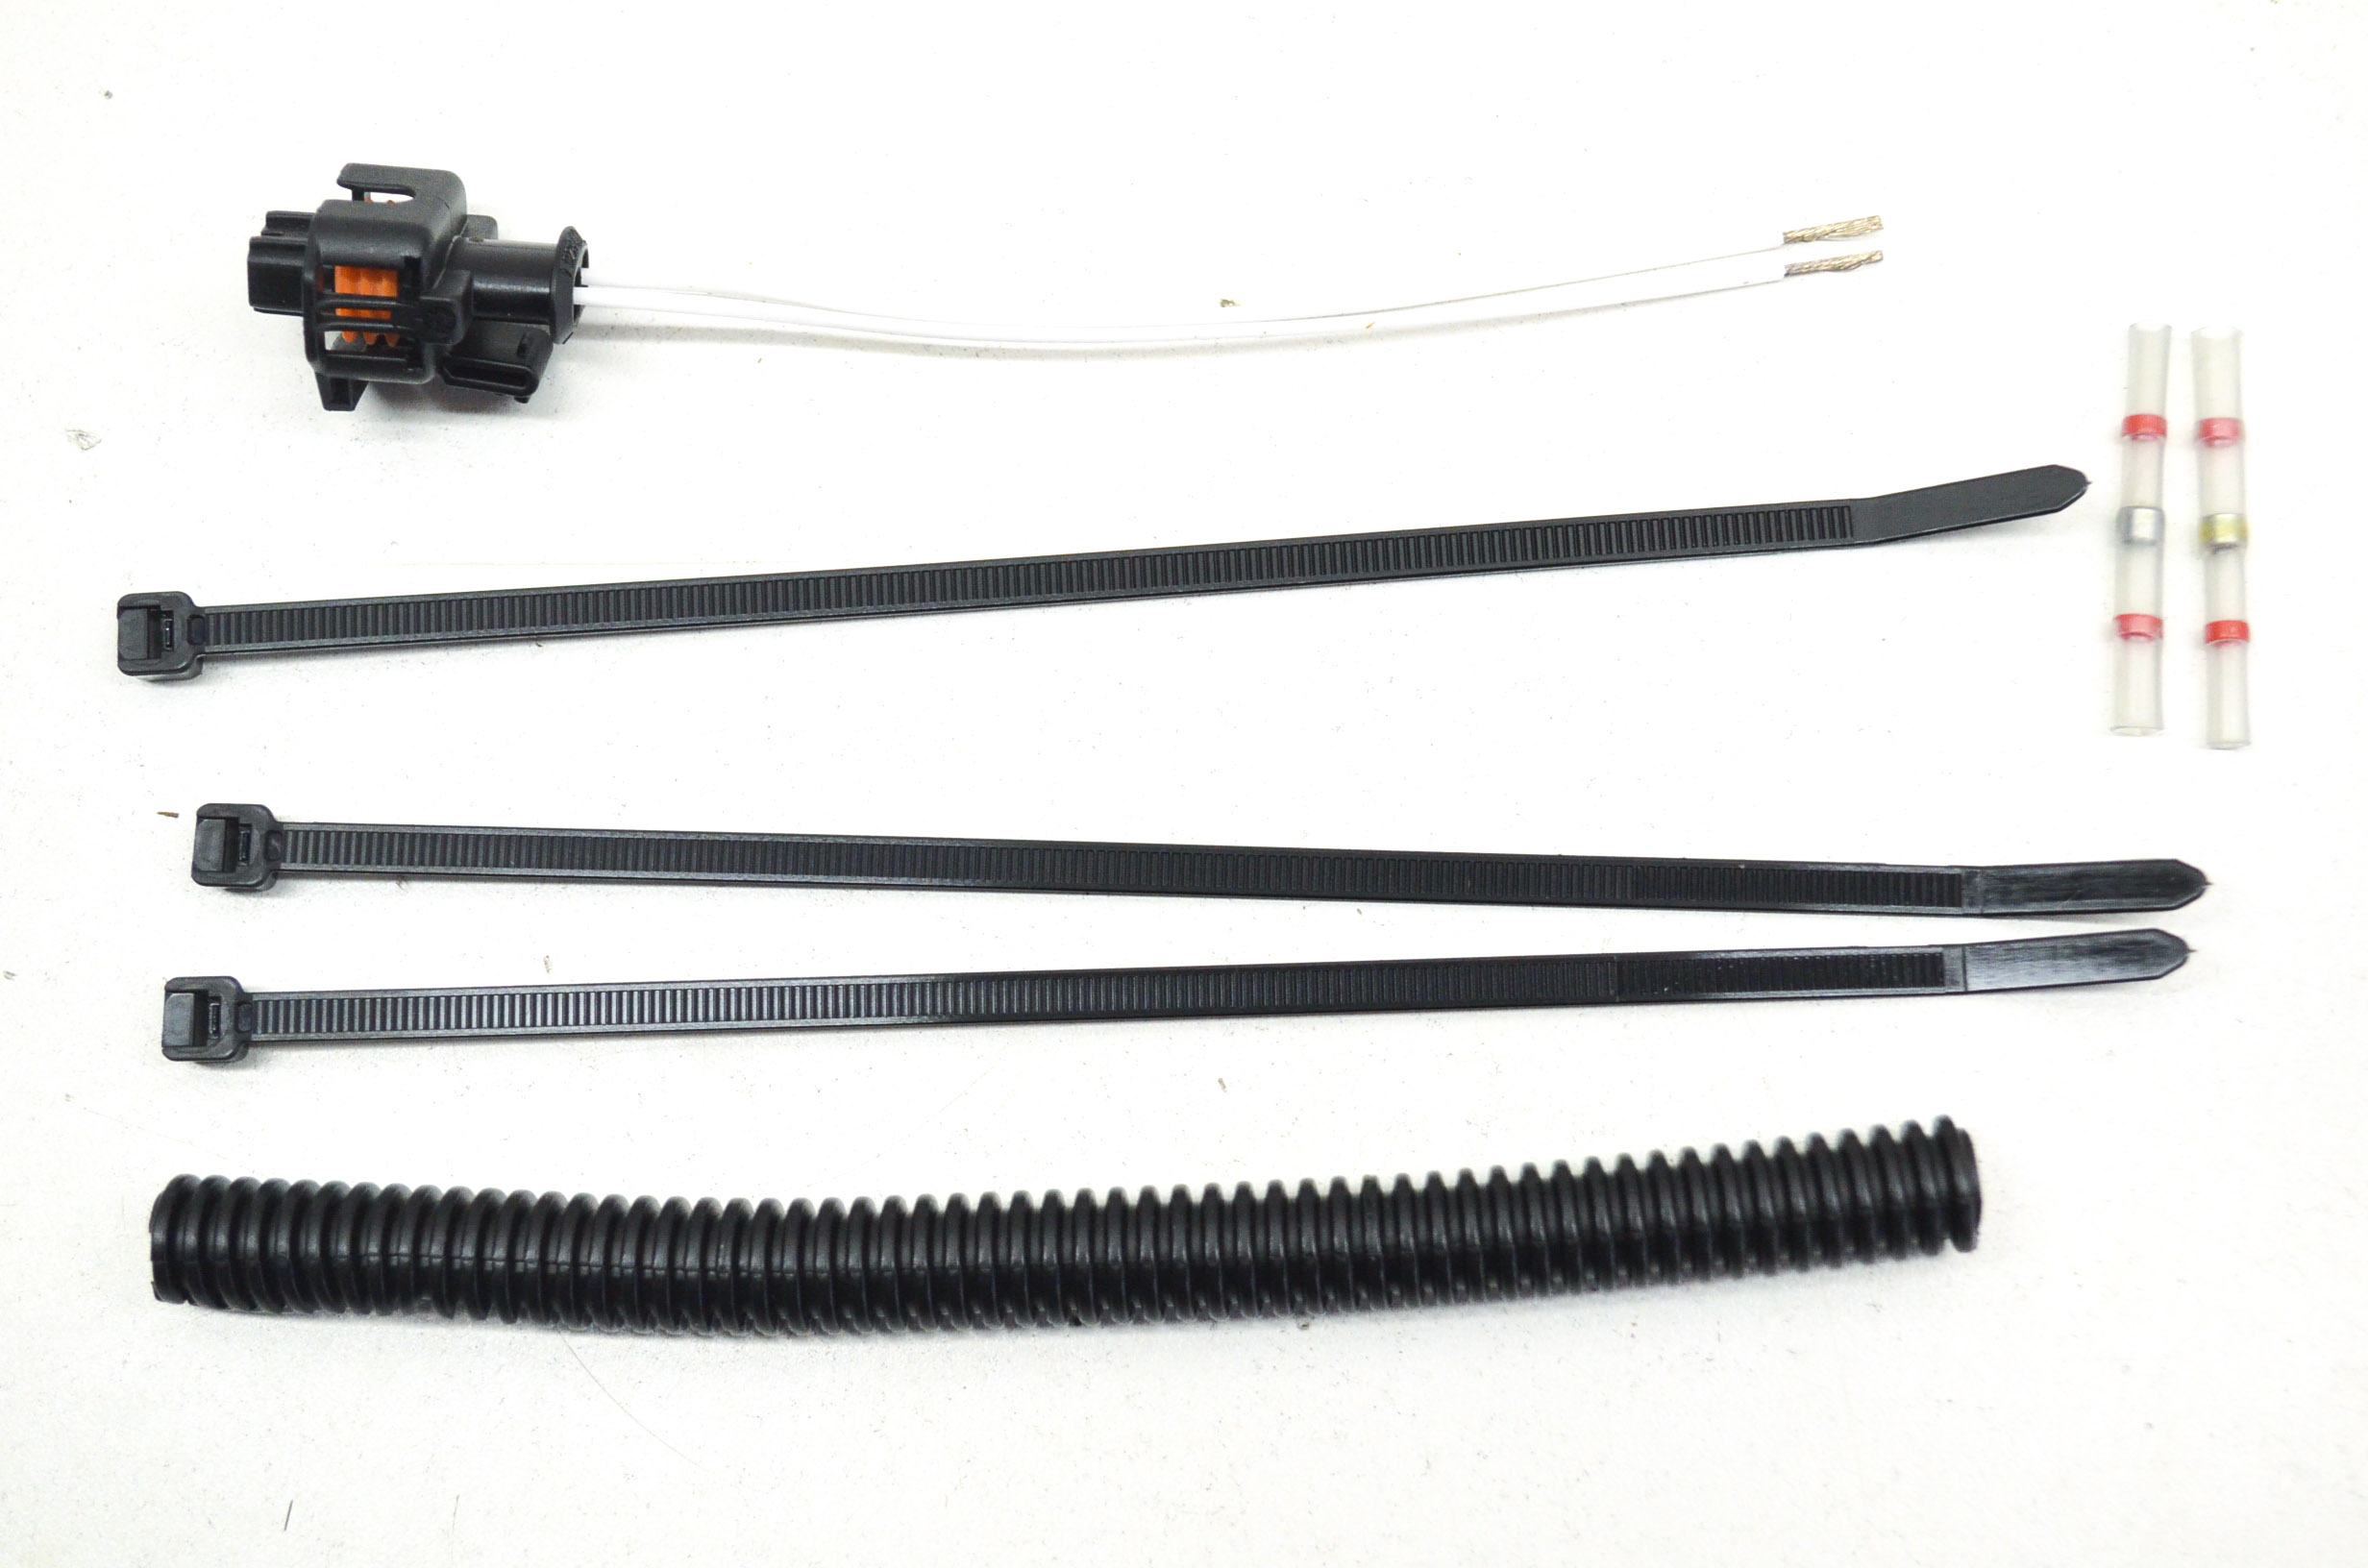 Oem Polaris Temp Sensor Harness Connector Repair